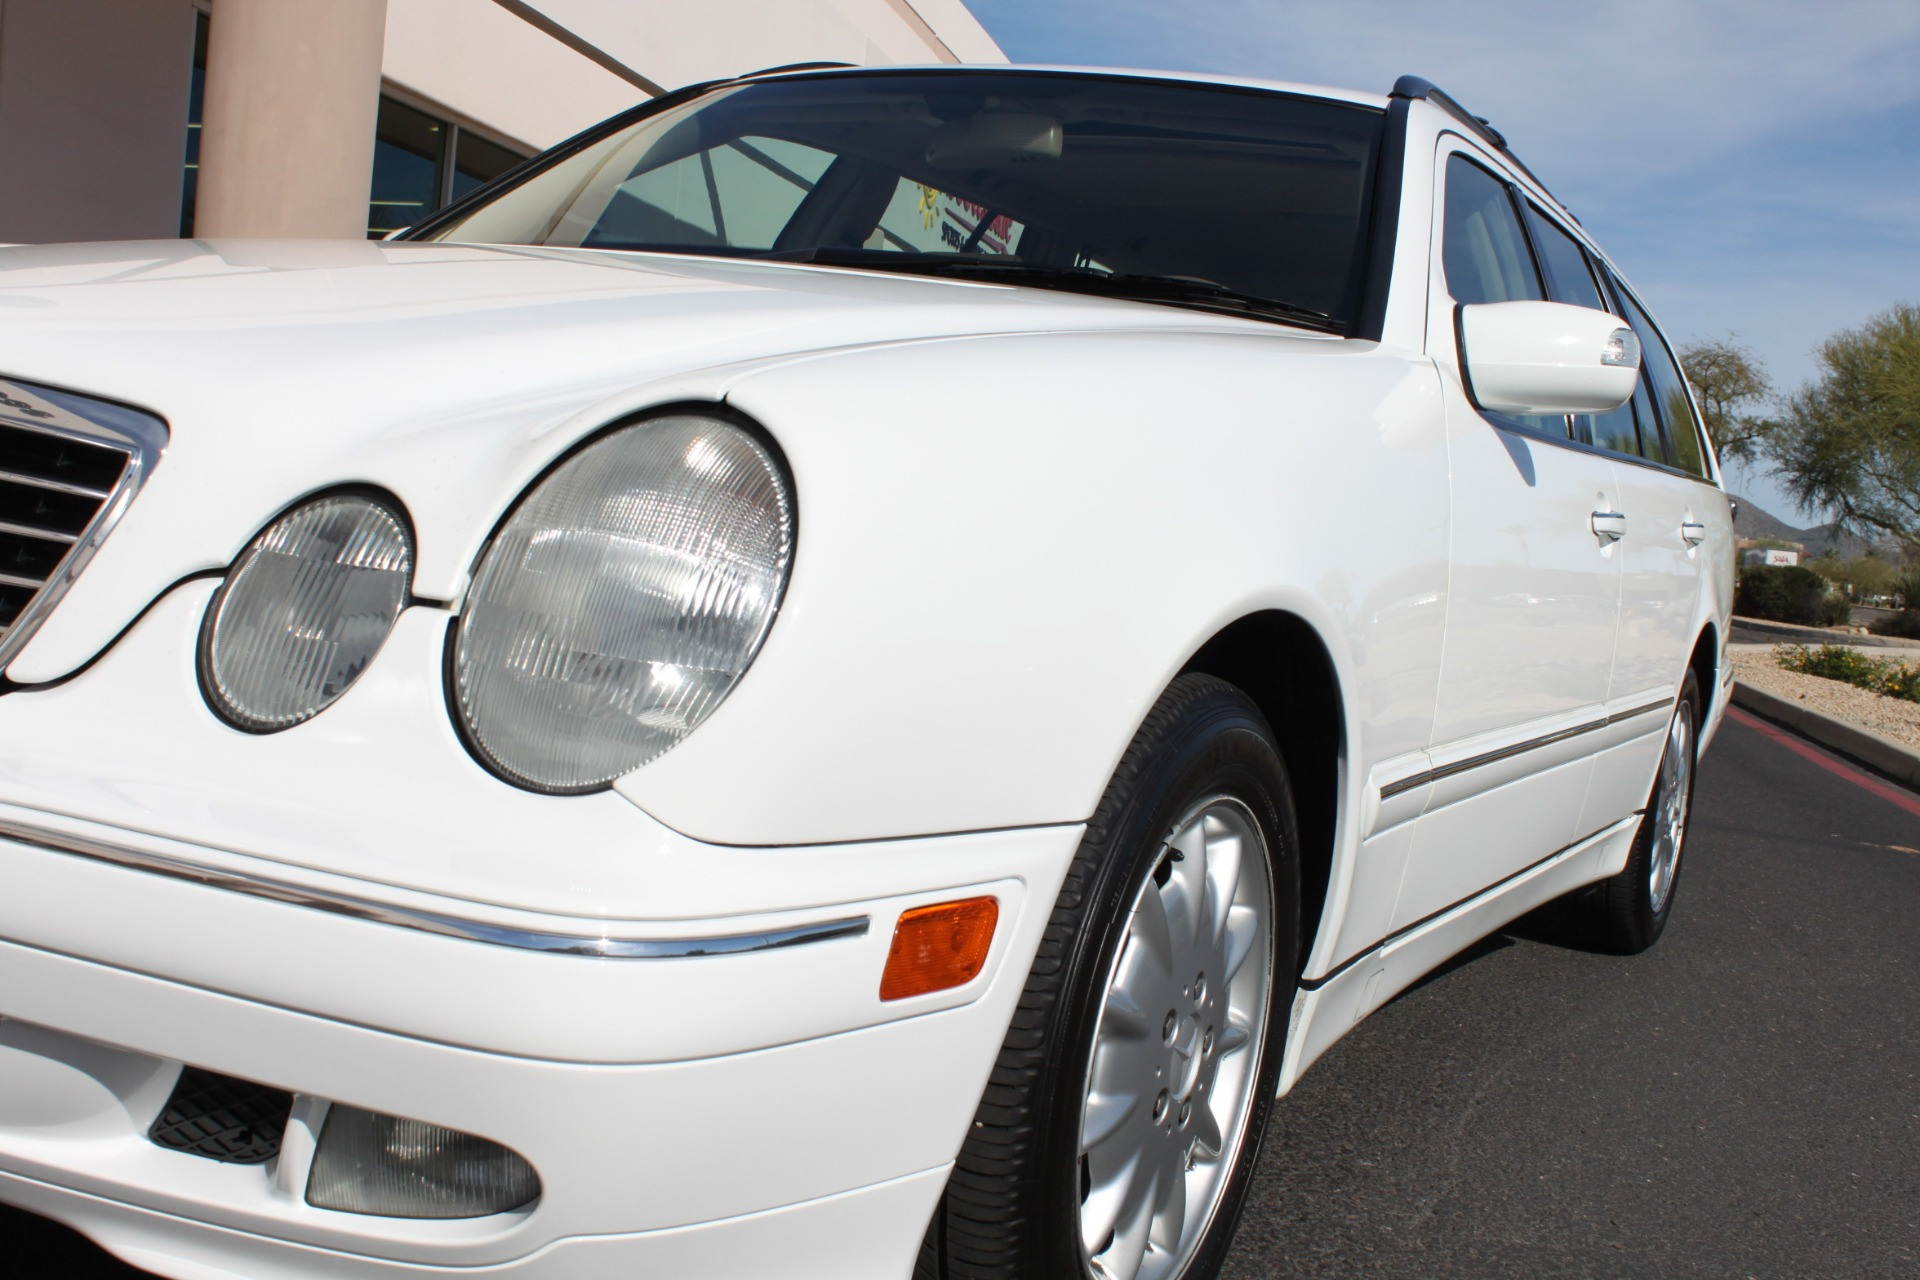 Used-2000-Mercedes-Benz-E-Class-Chevrolet